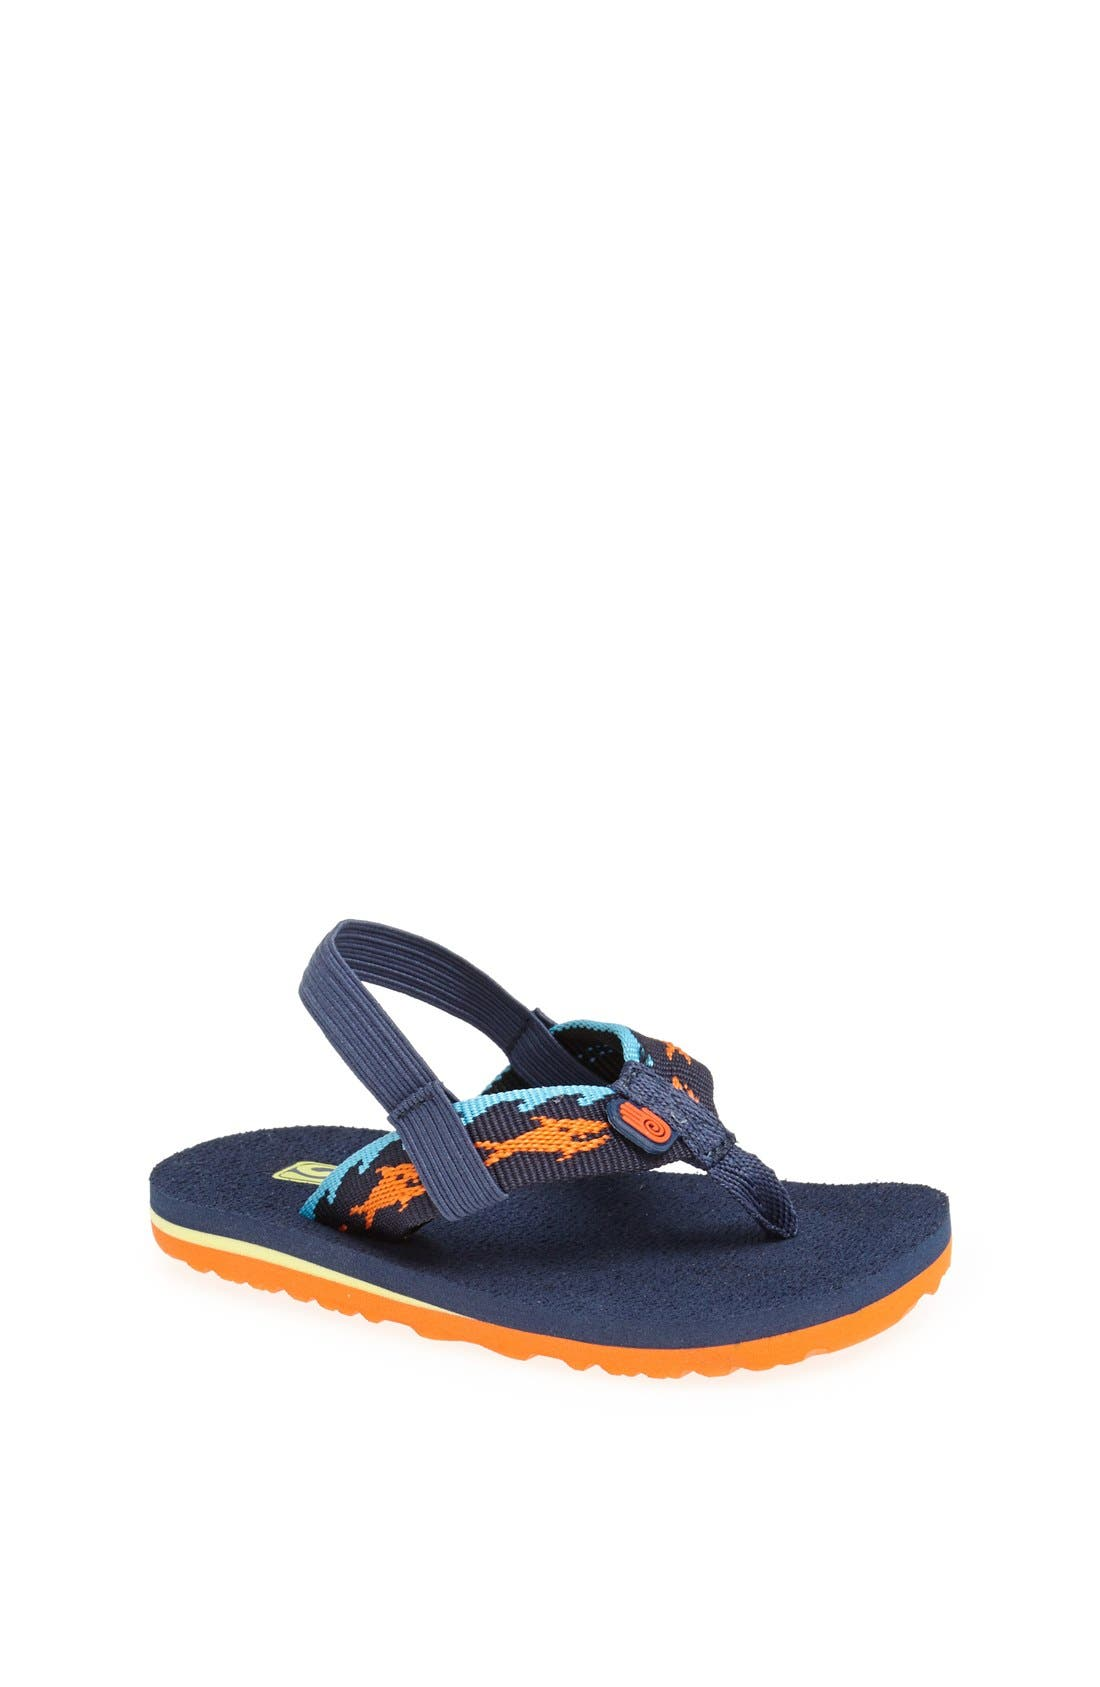 Alternate Image 1 Selected - Teva 'Mush' Sandal (Baby & Walker)